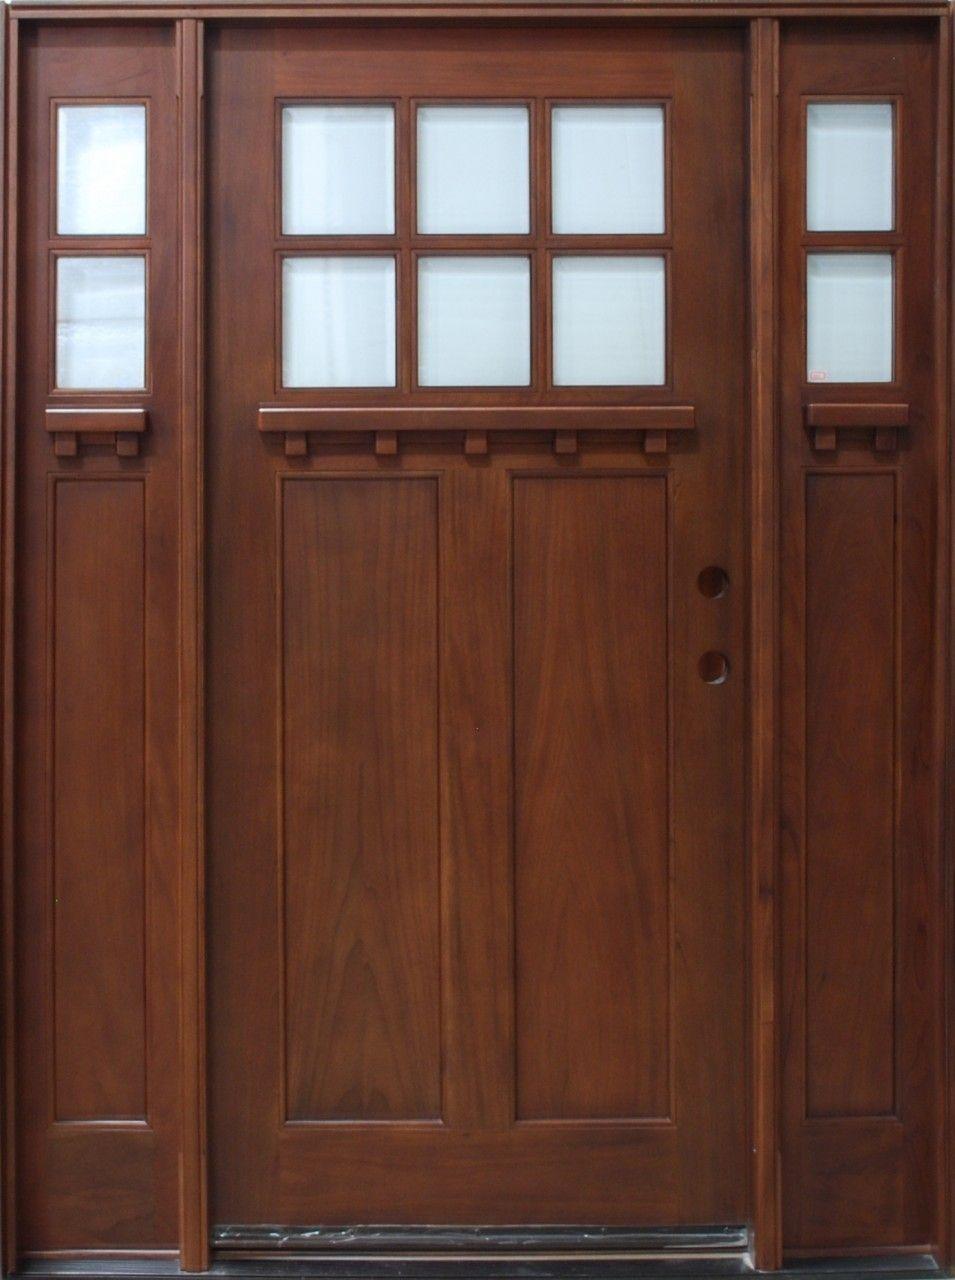 Craftsman Ranch Home Front Doors | Discount Door Center Prehung And  Prefinished Craftman Entry Door With